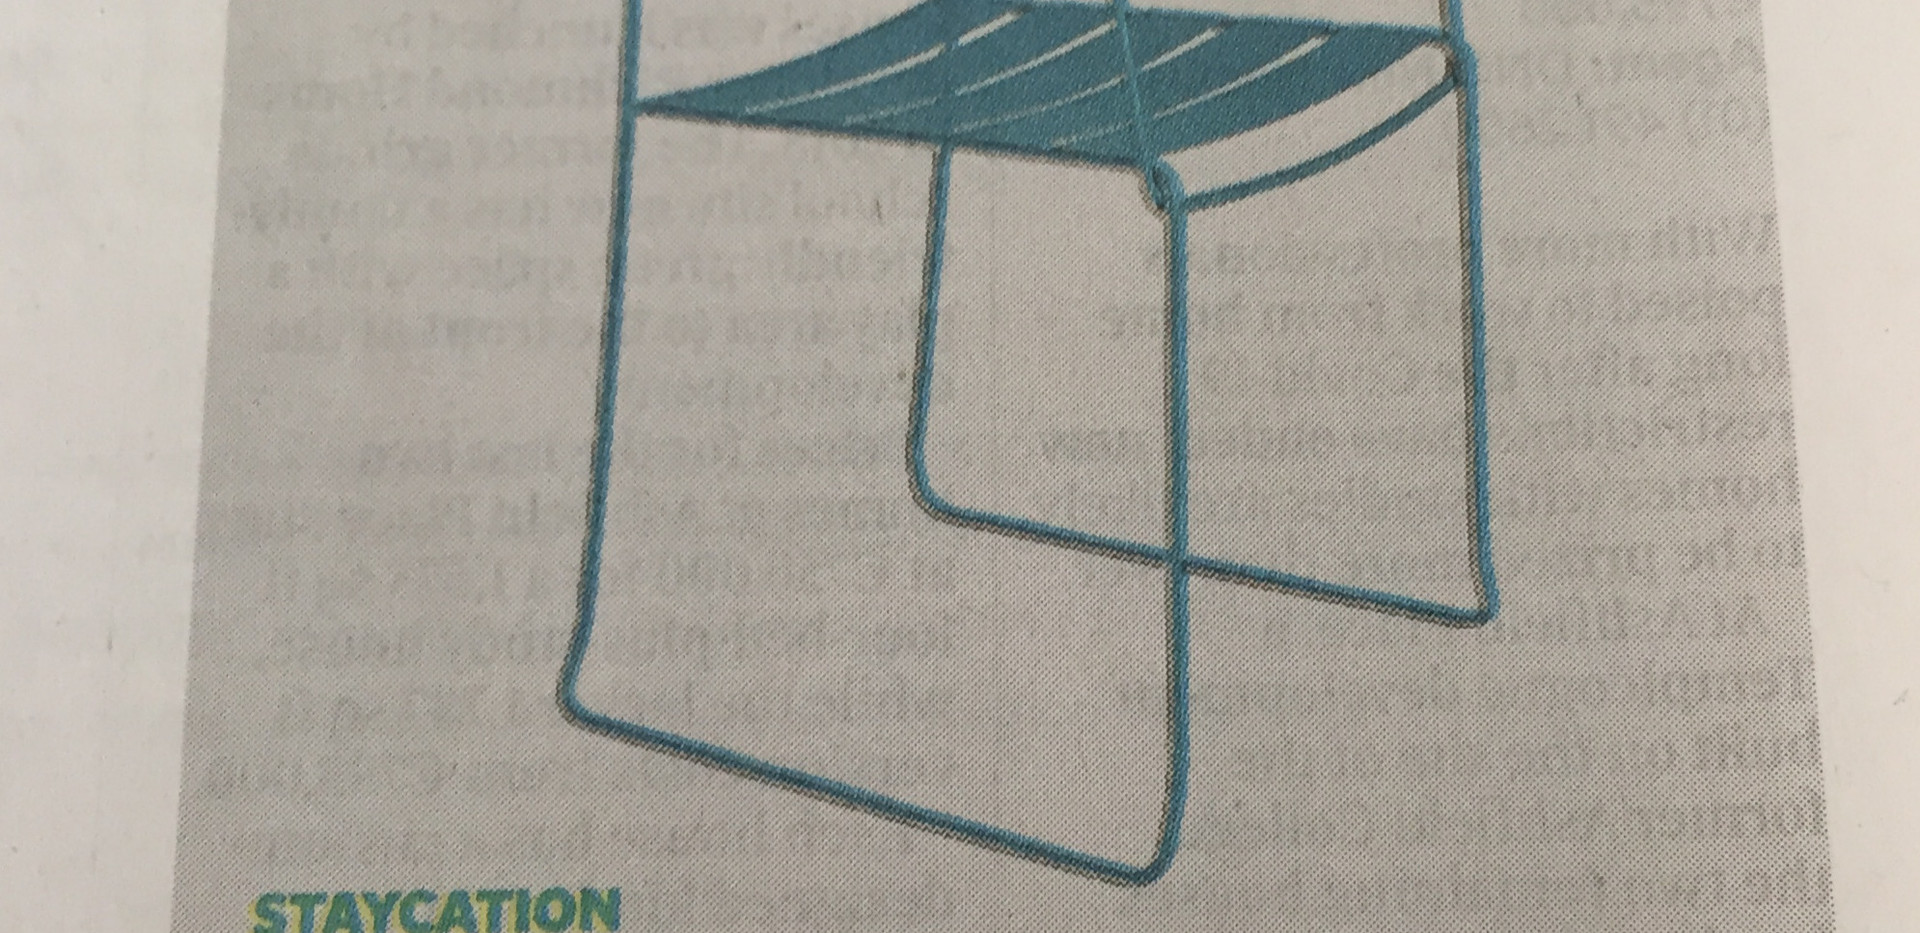 Independent_closeup_19.06_edited.jpg